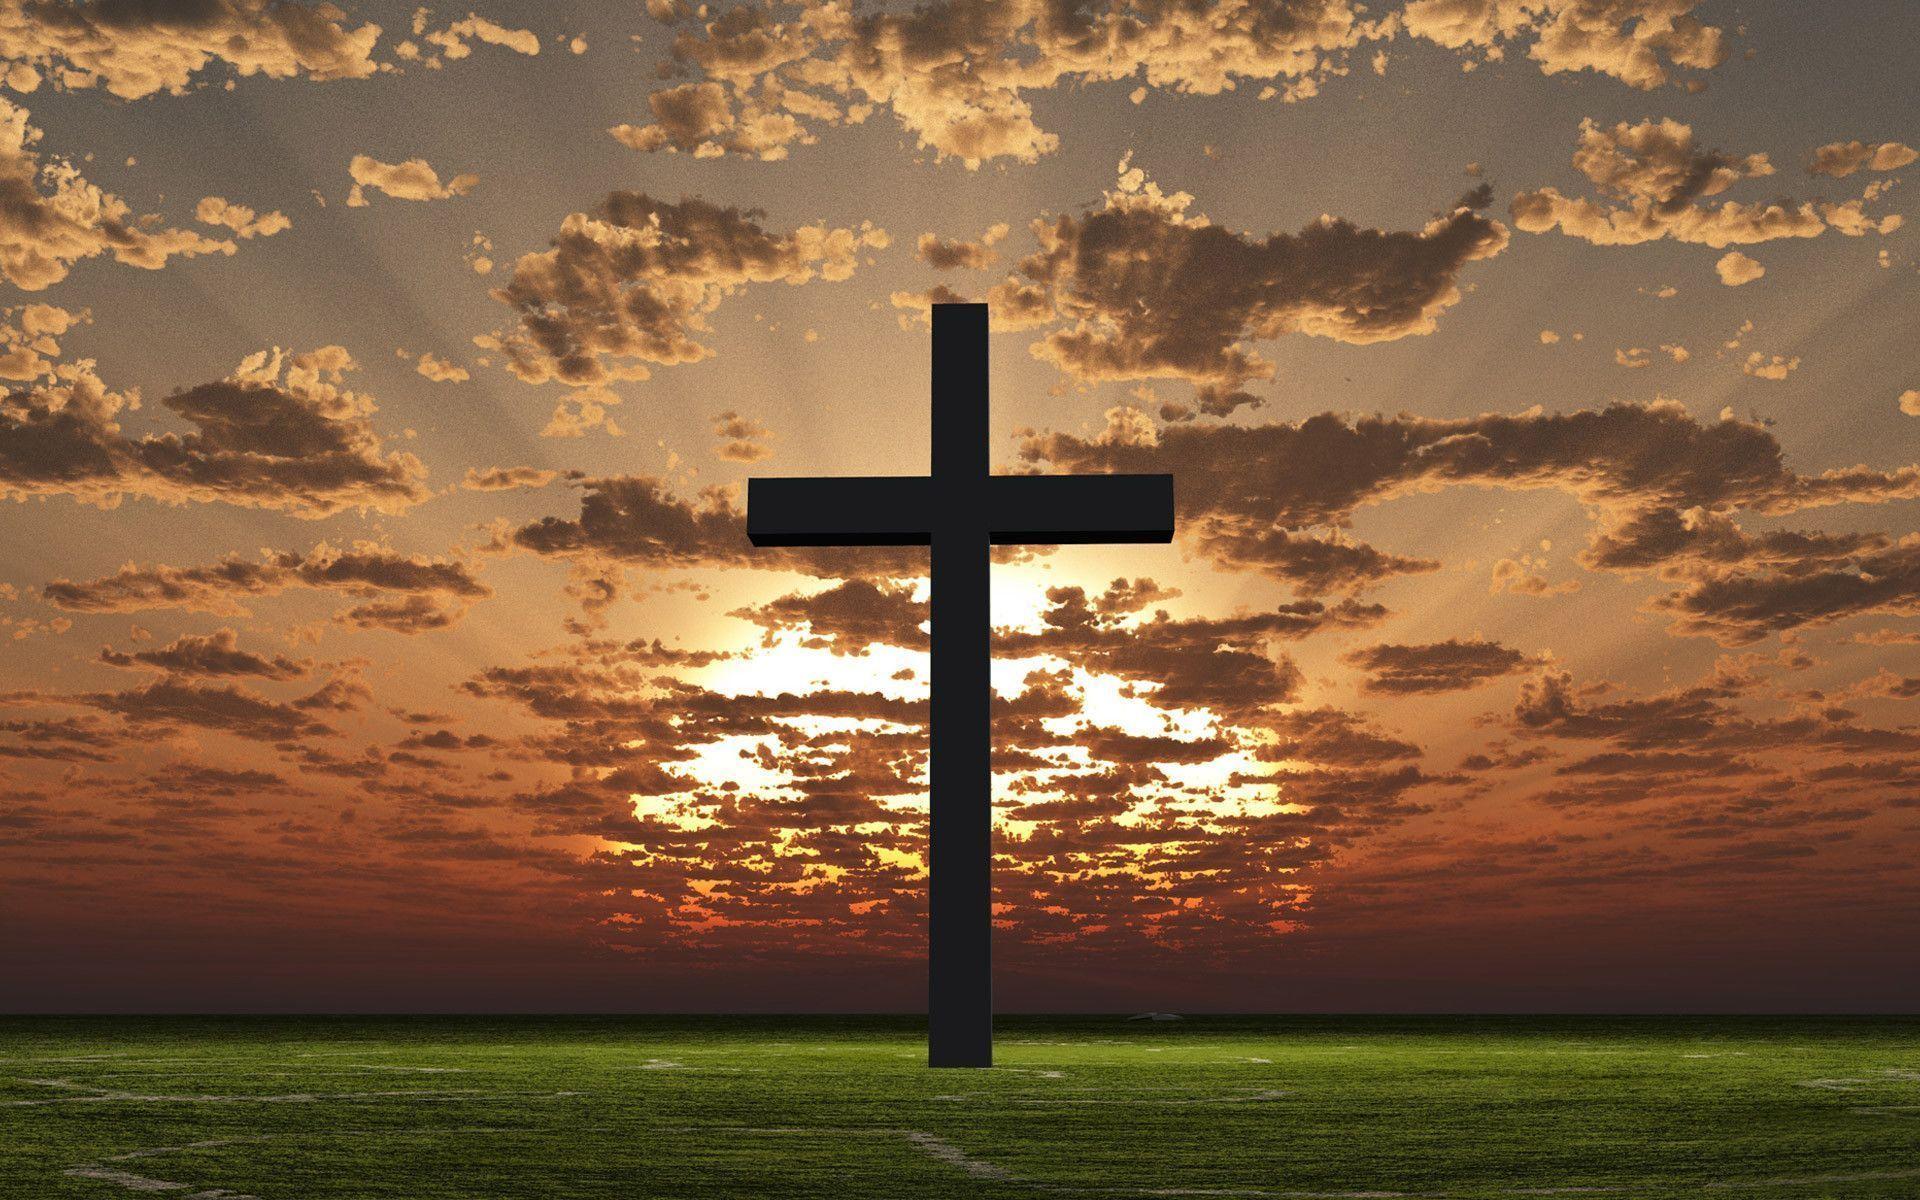 Jesus pictures, Jesus images